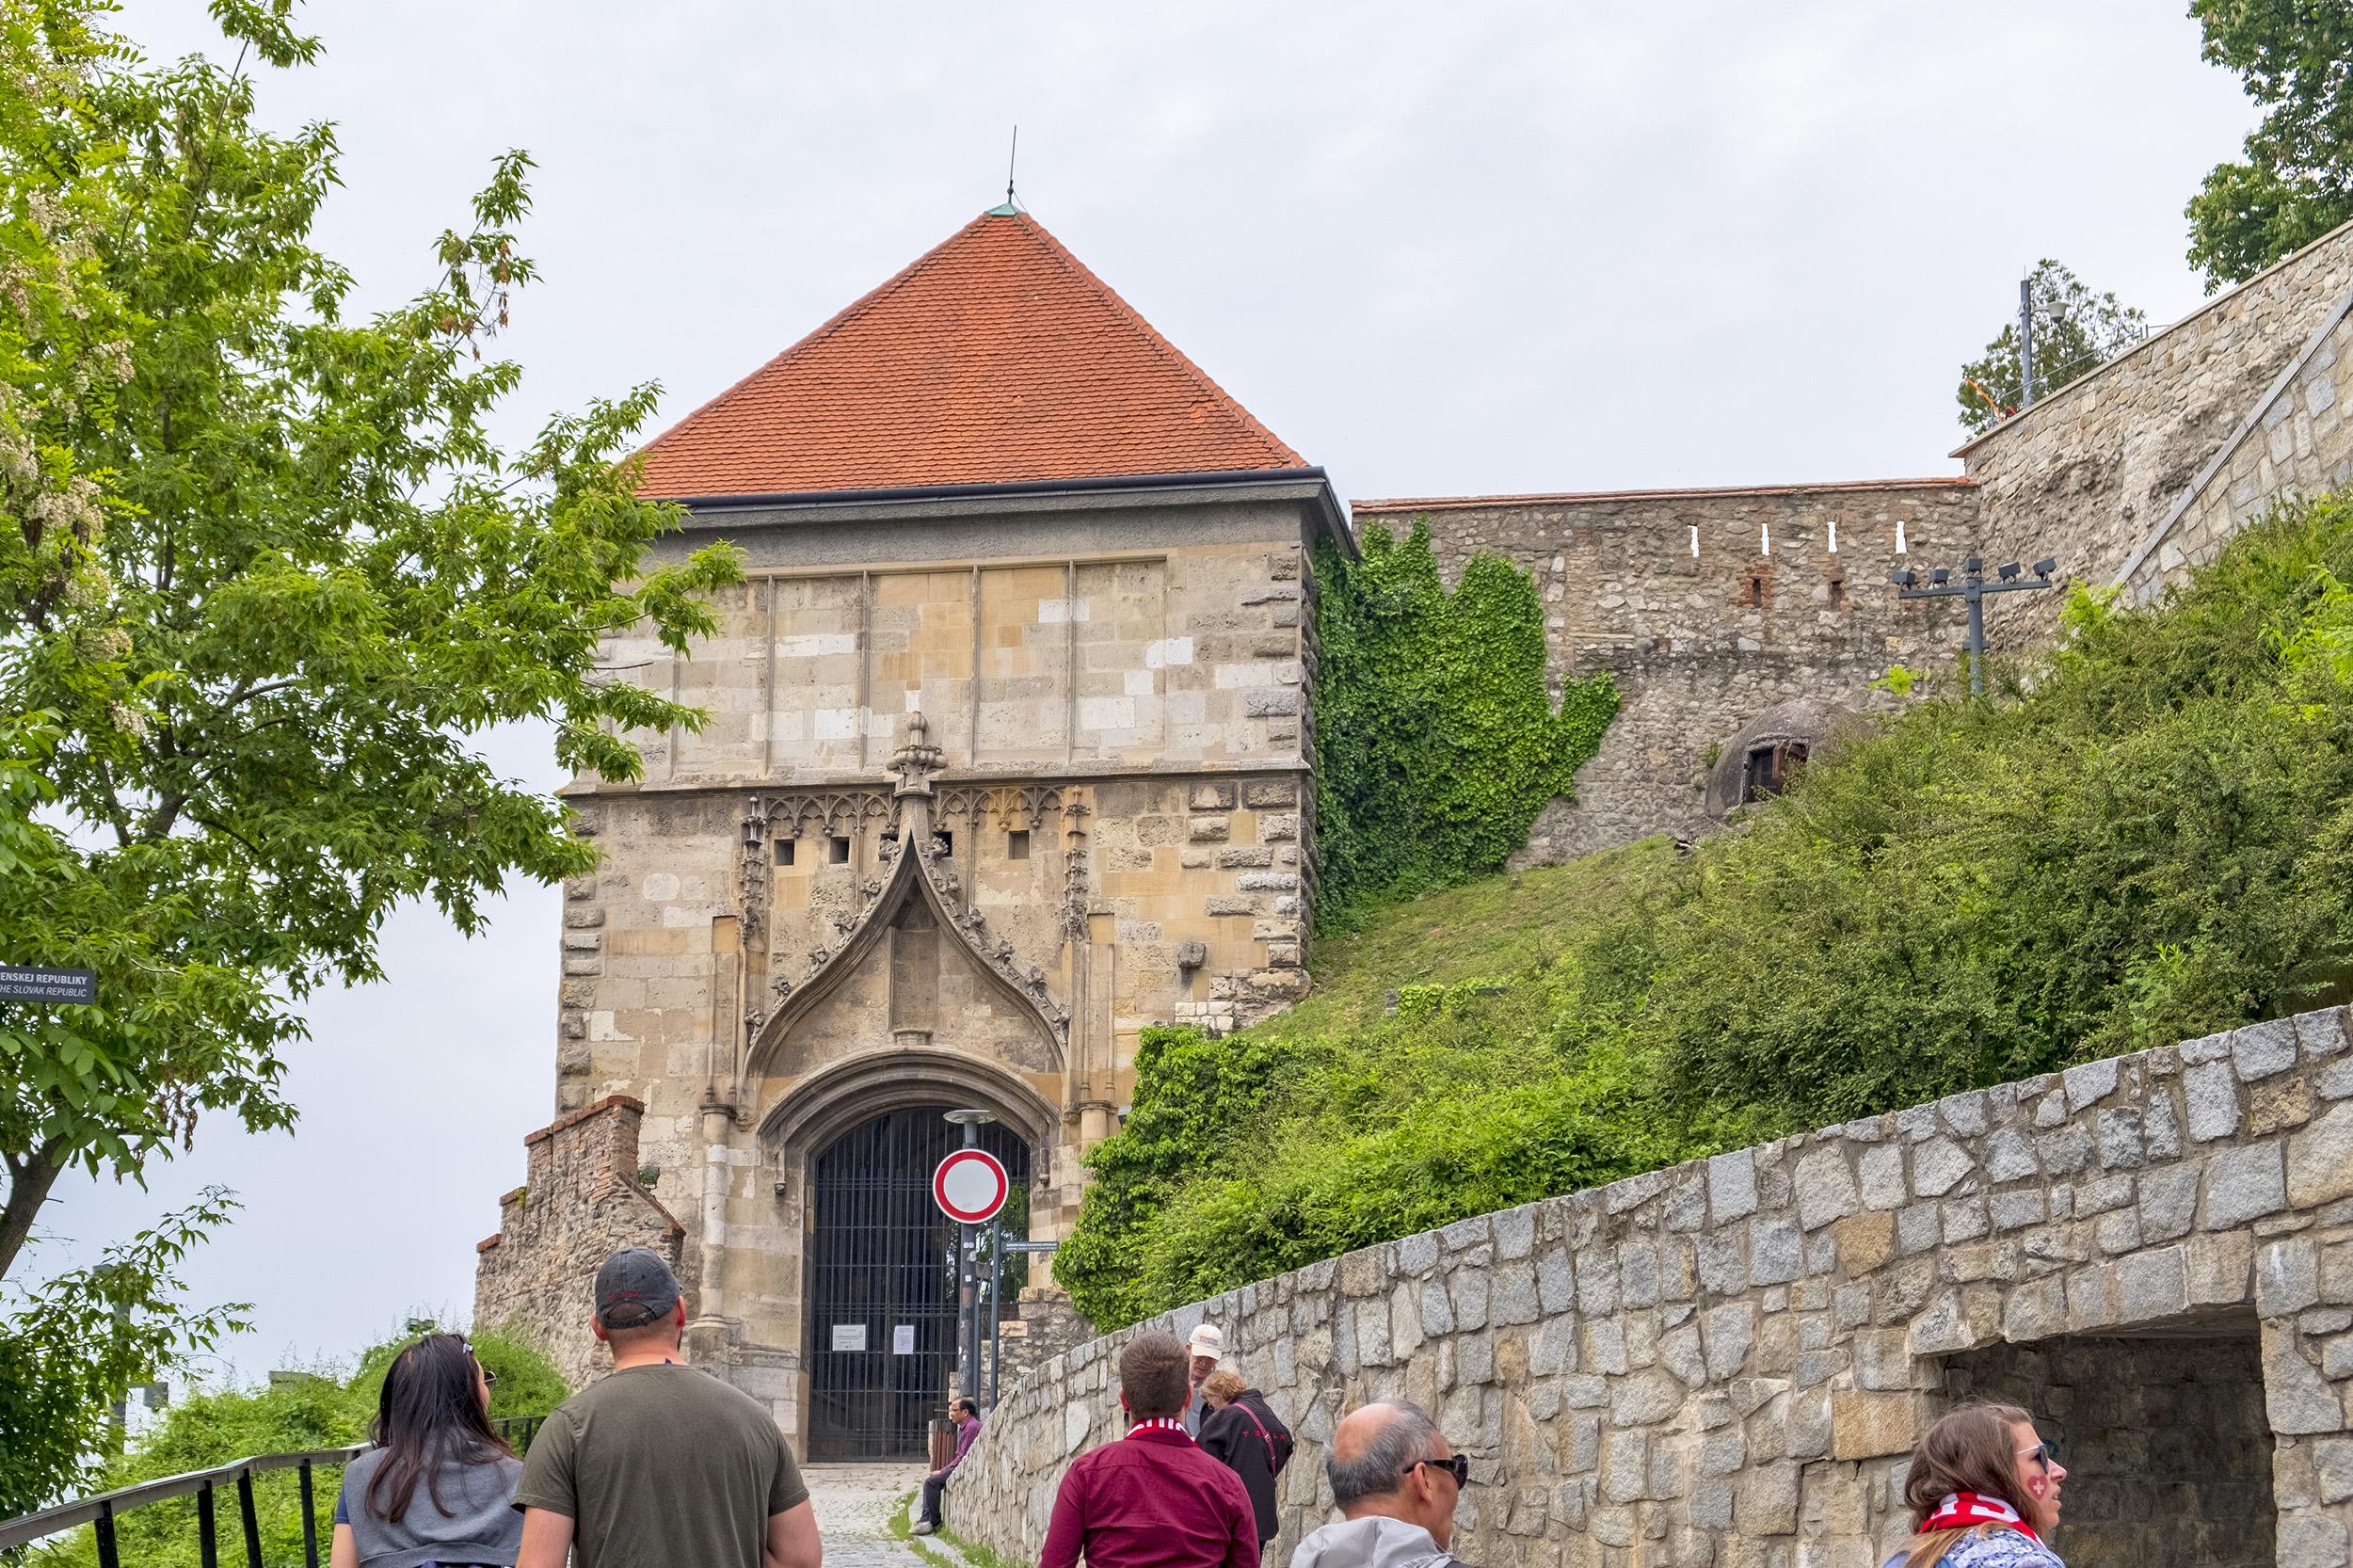 Sigismunds Gate Slottet i Bratislava